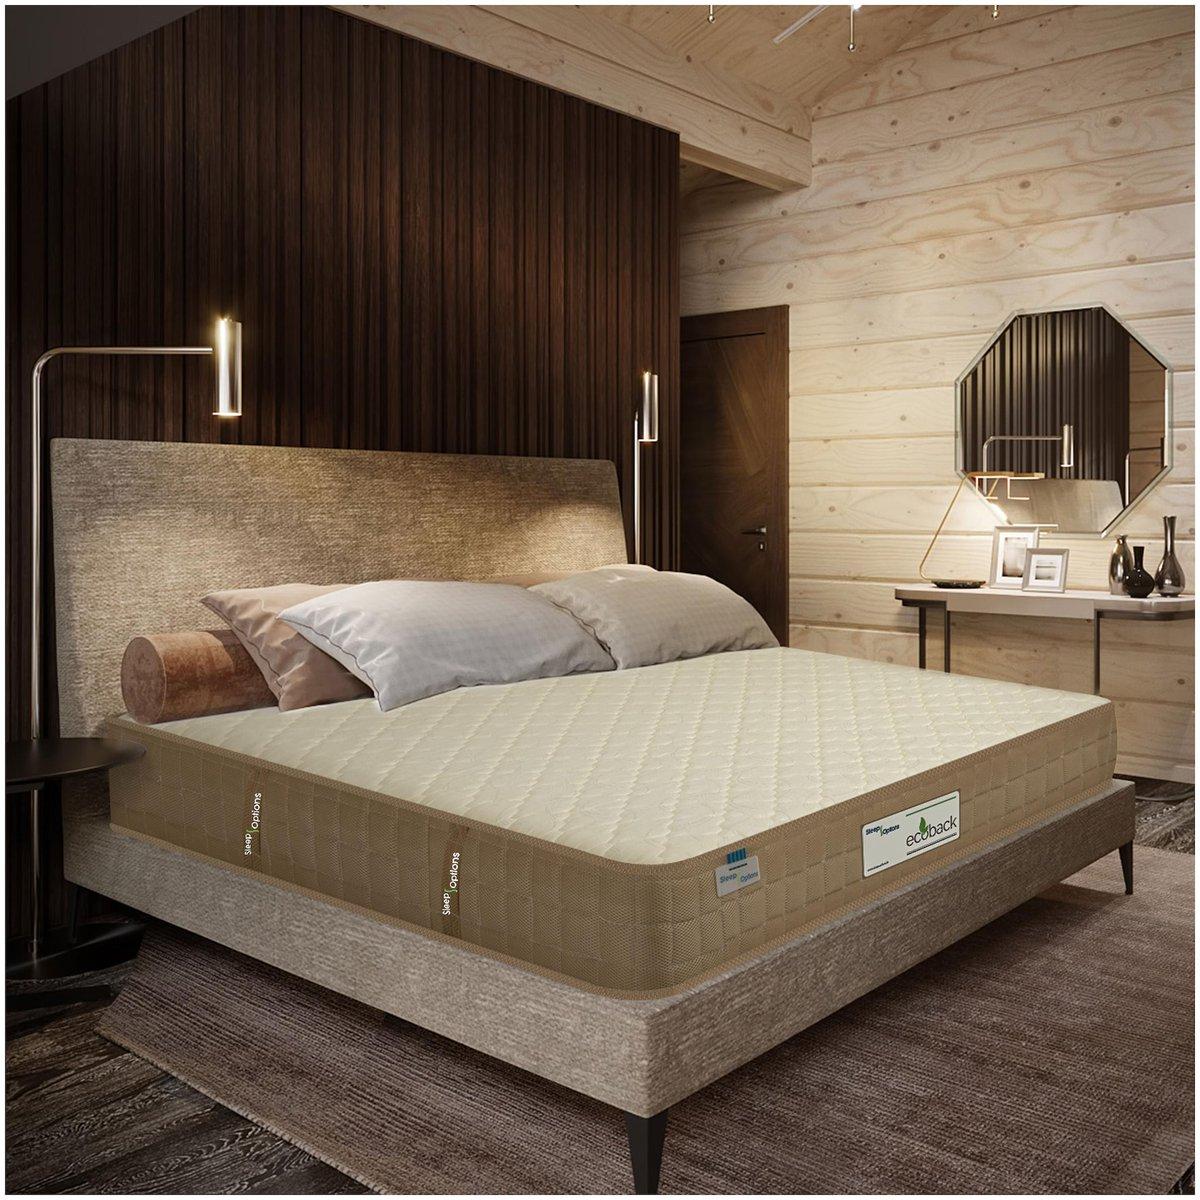 Sleep Options 4 inch Foam Double Mattress, | ajarstore ₹6629.0...